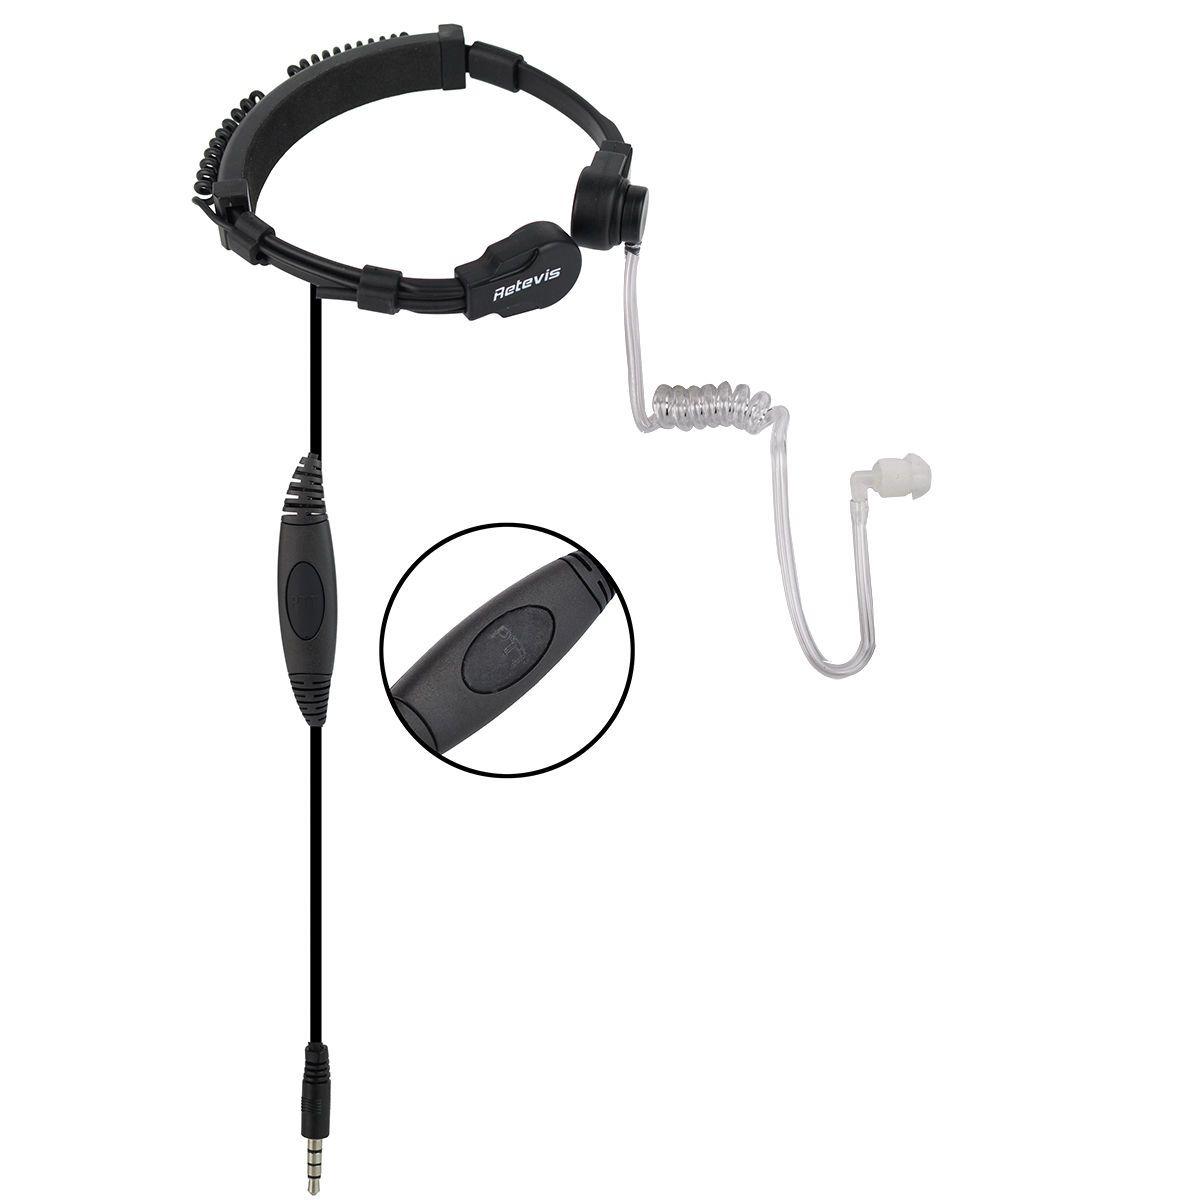 2X Retevis R-151 1Pin PTT Throat Mic Earpiece Earphone For Mobile Phone & Radio